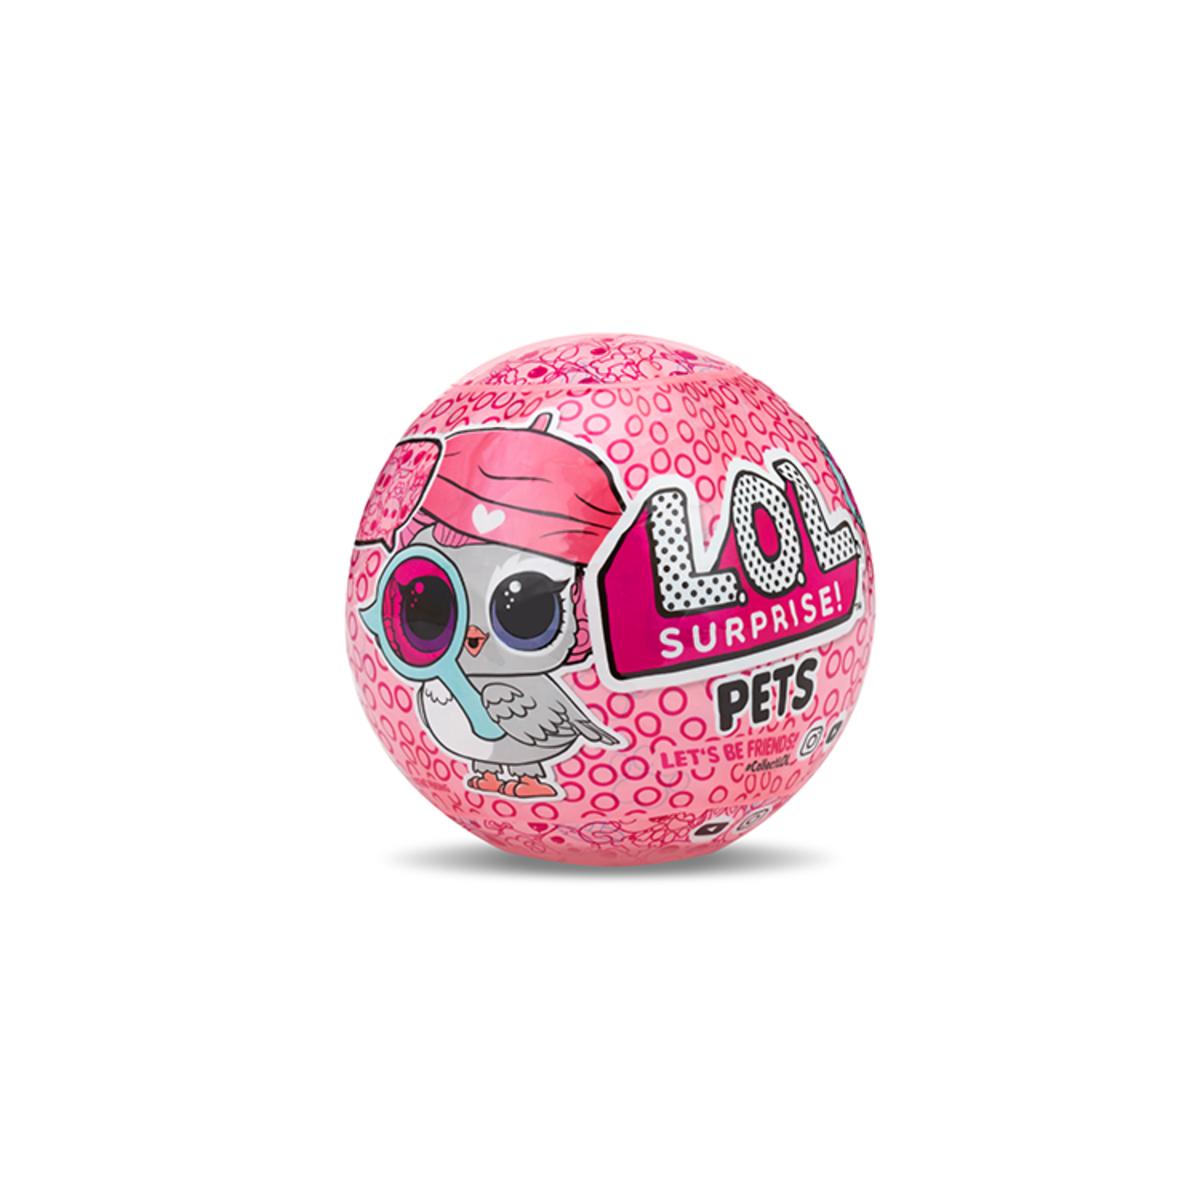 Surprise Pets Asst in PDQ (Series 4)